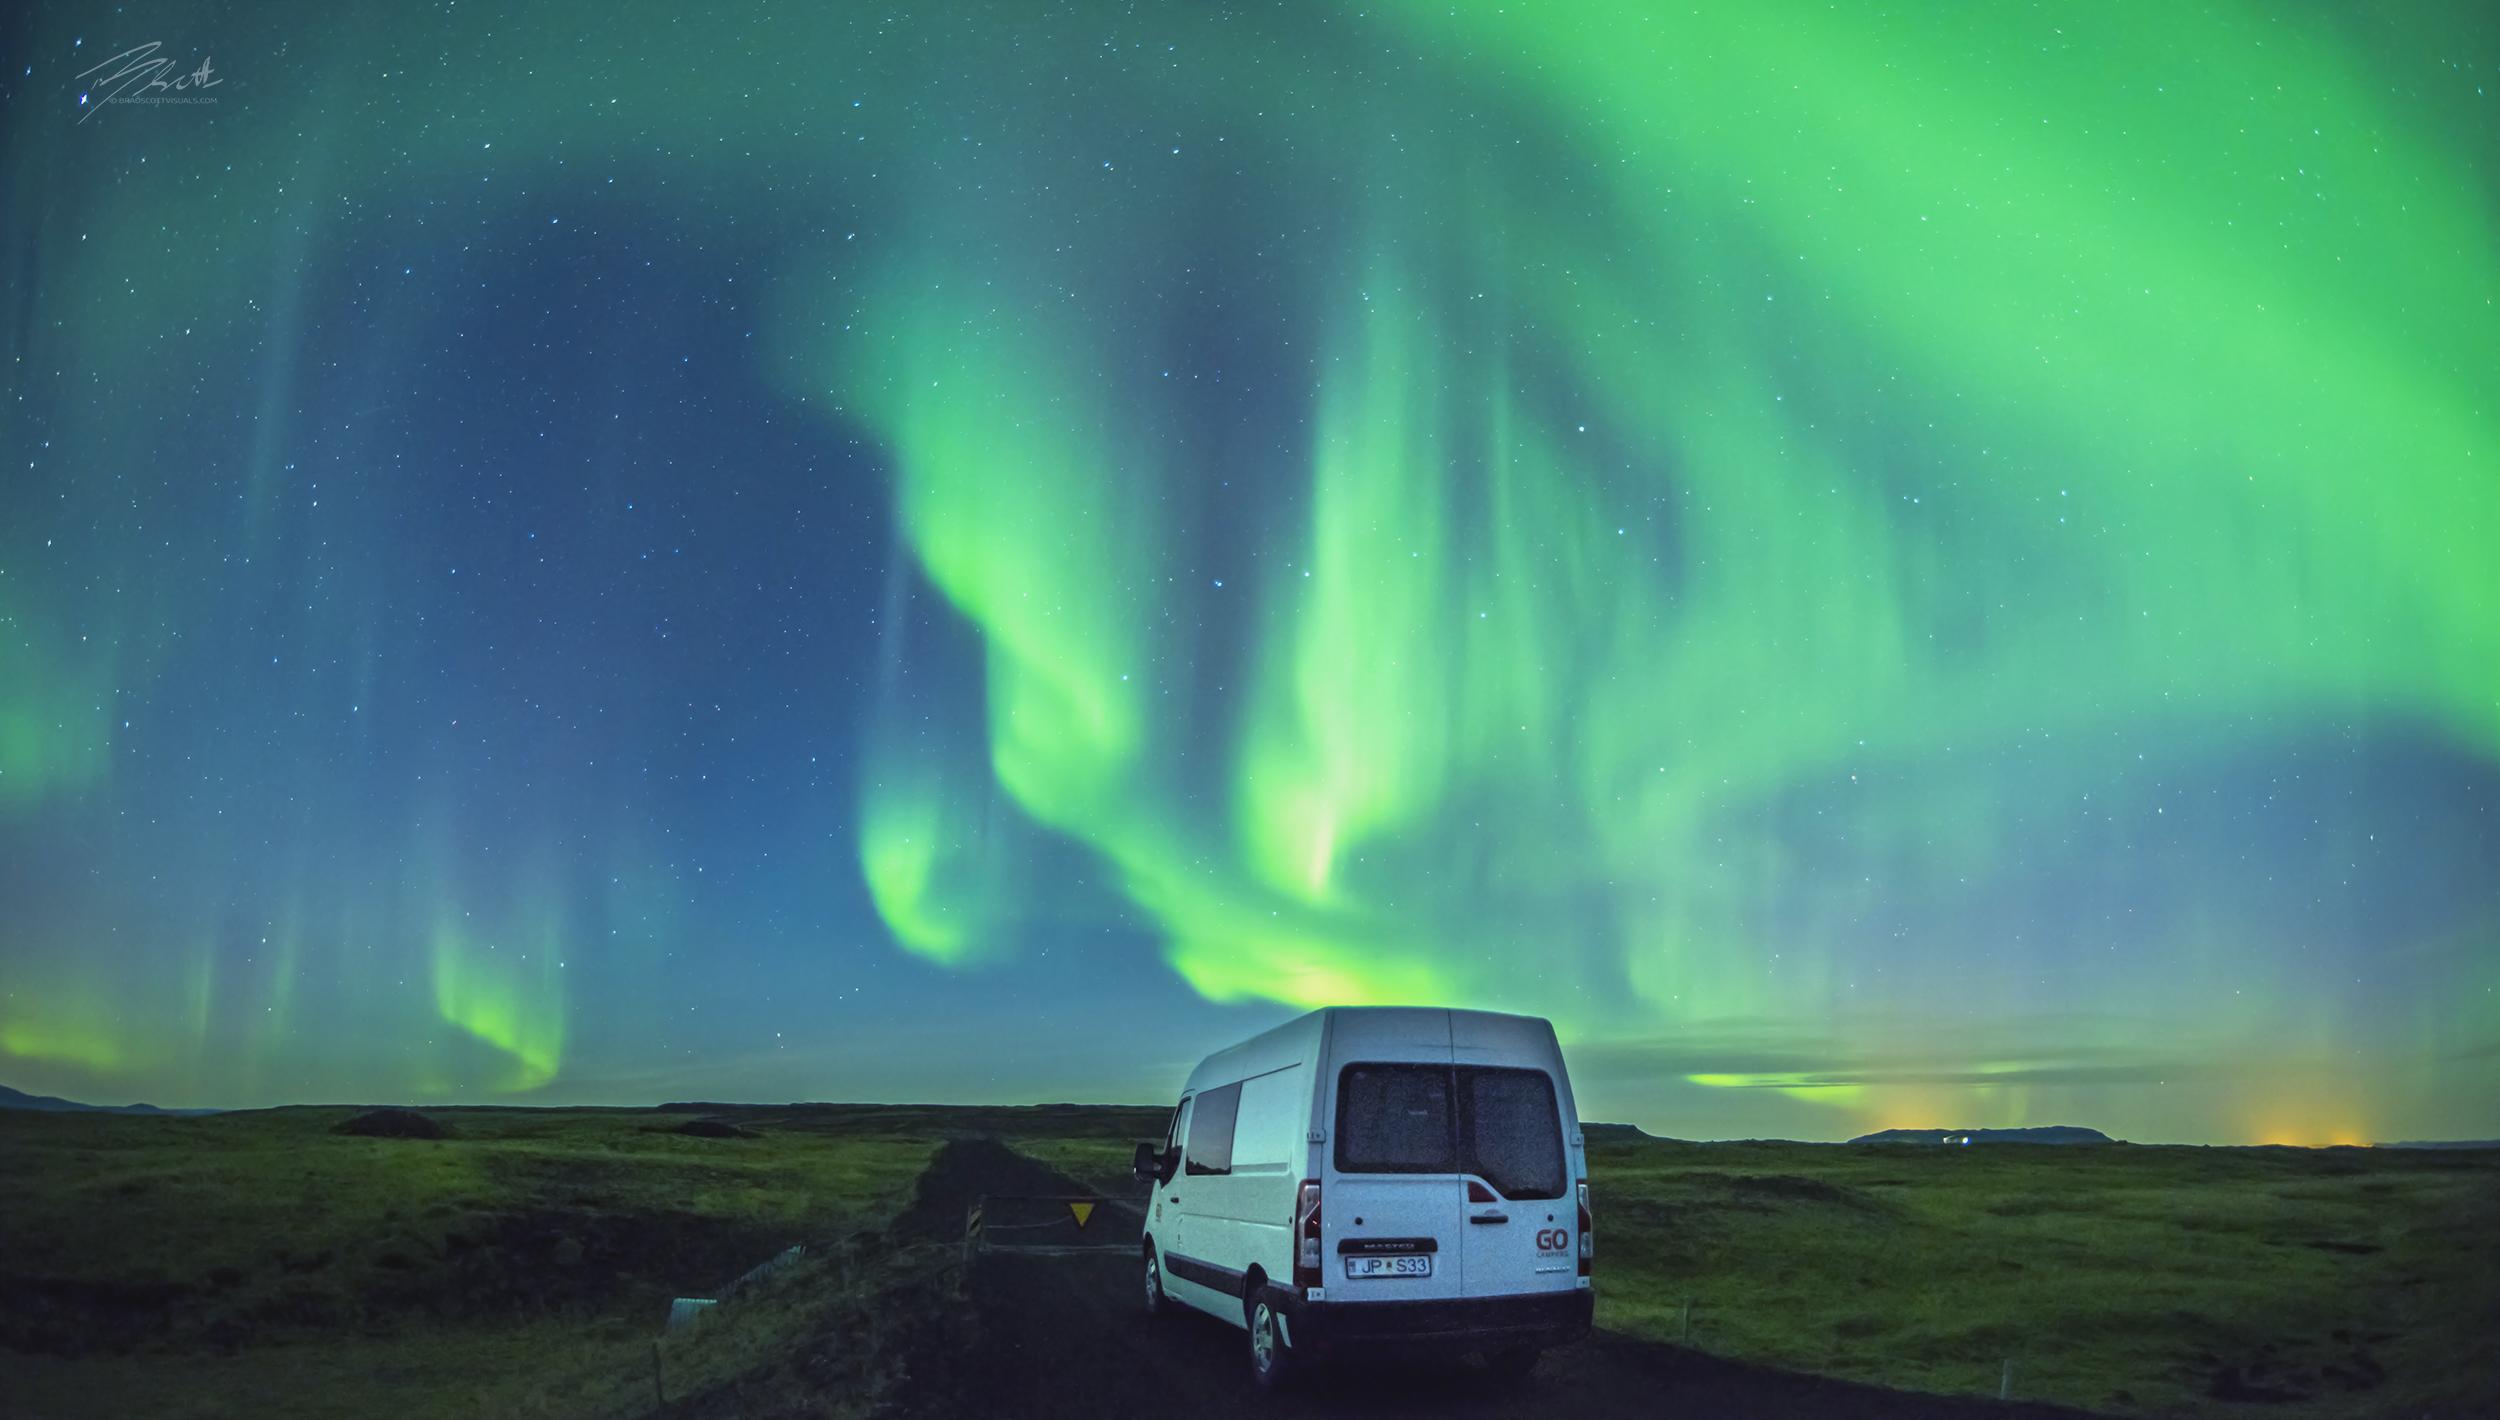 Gocampers Northern Lights